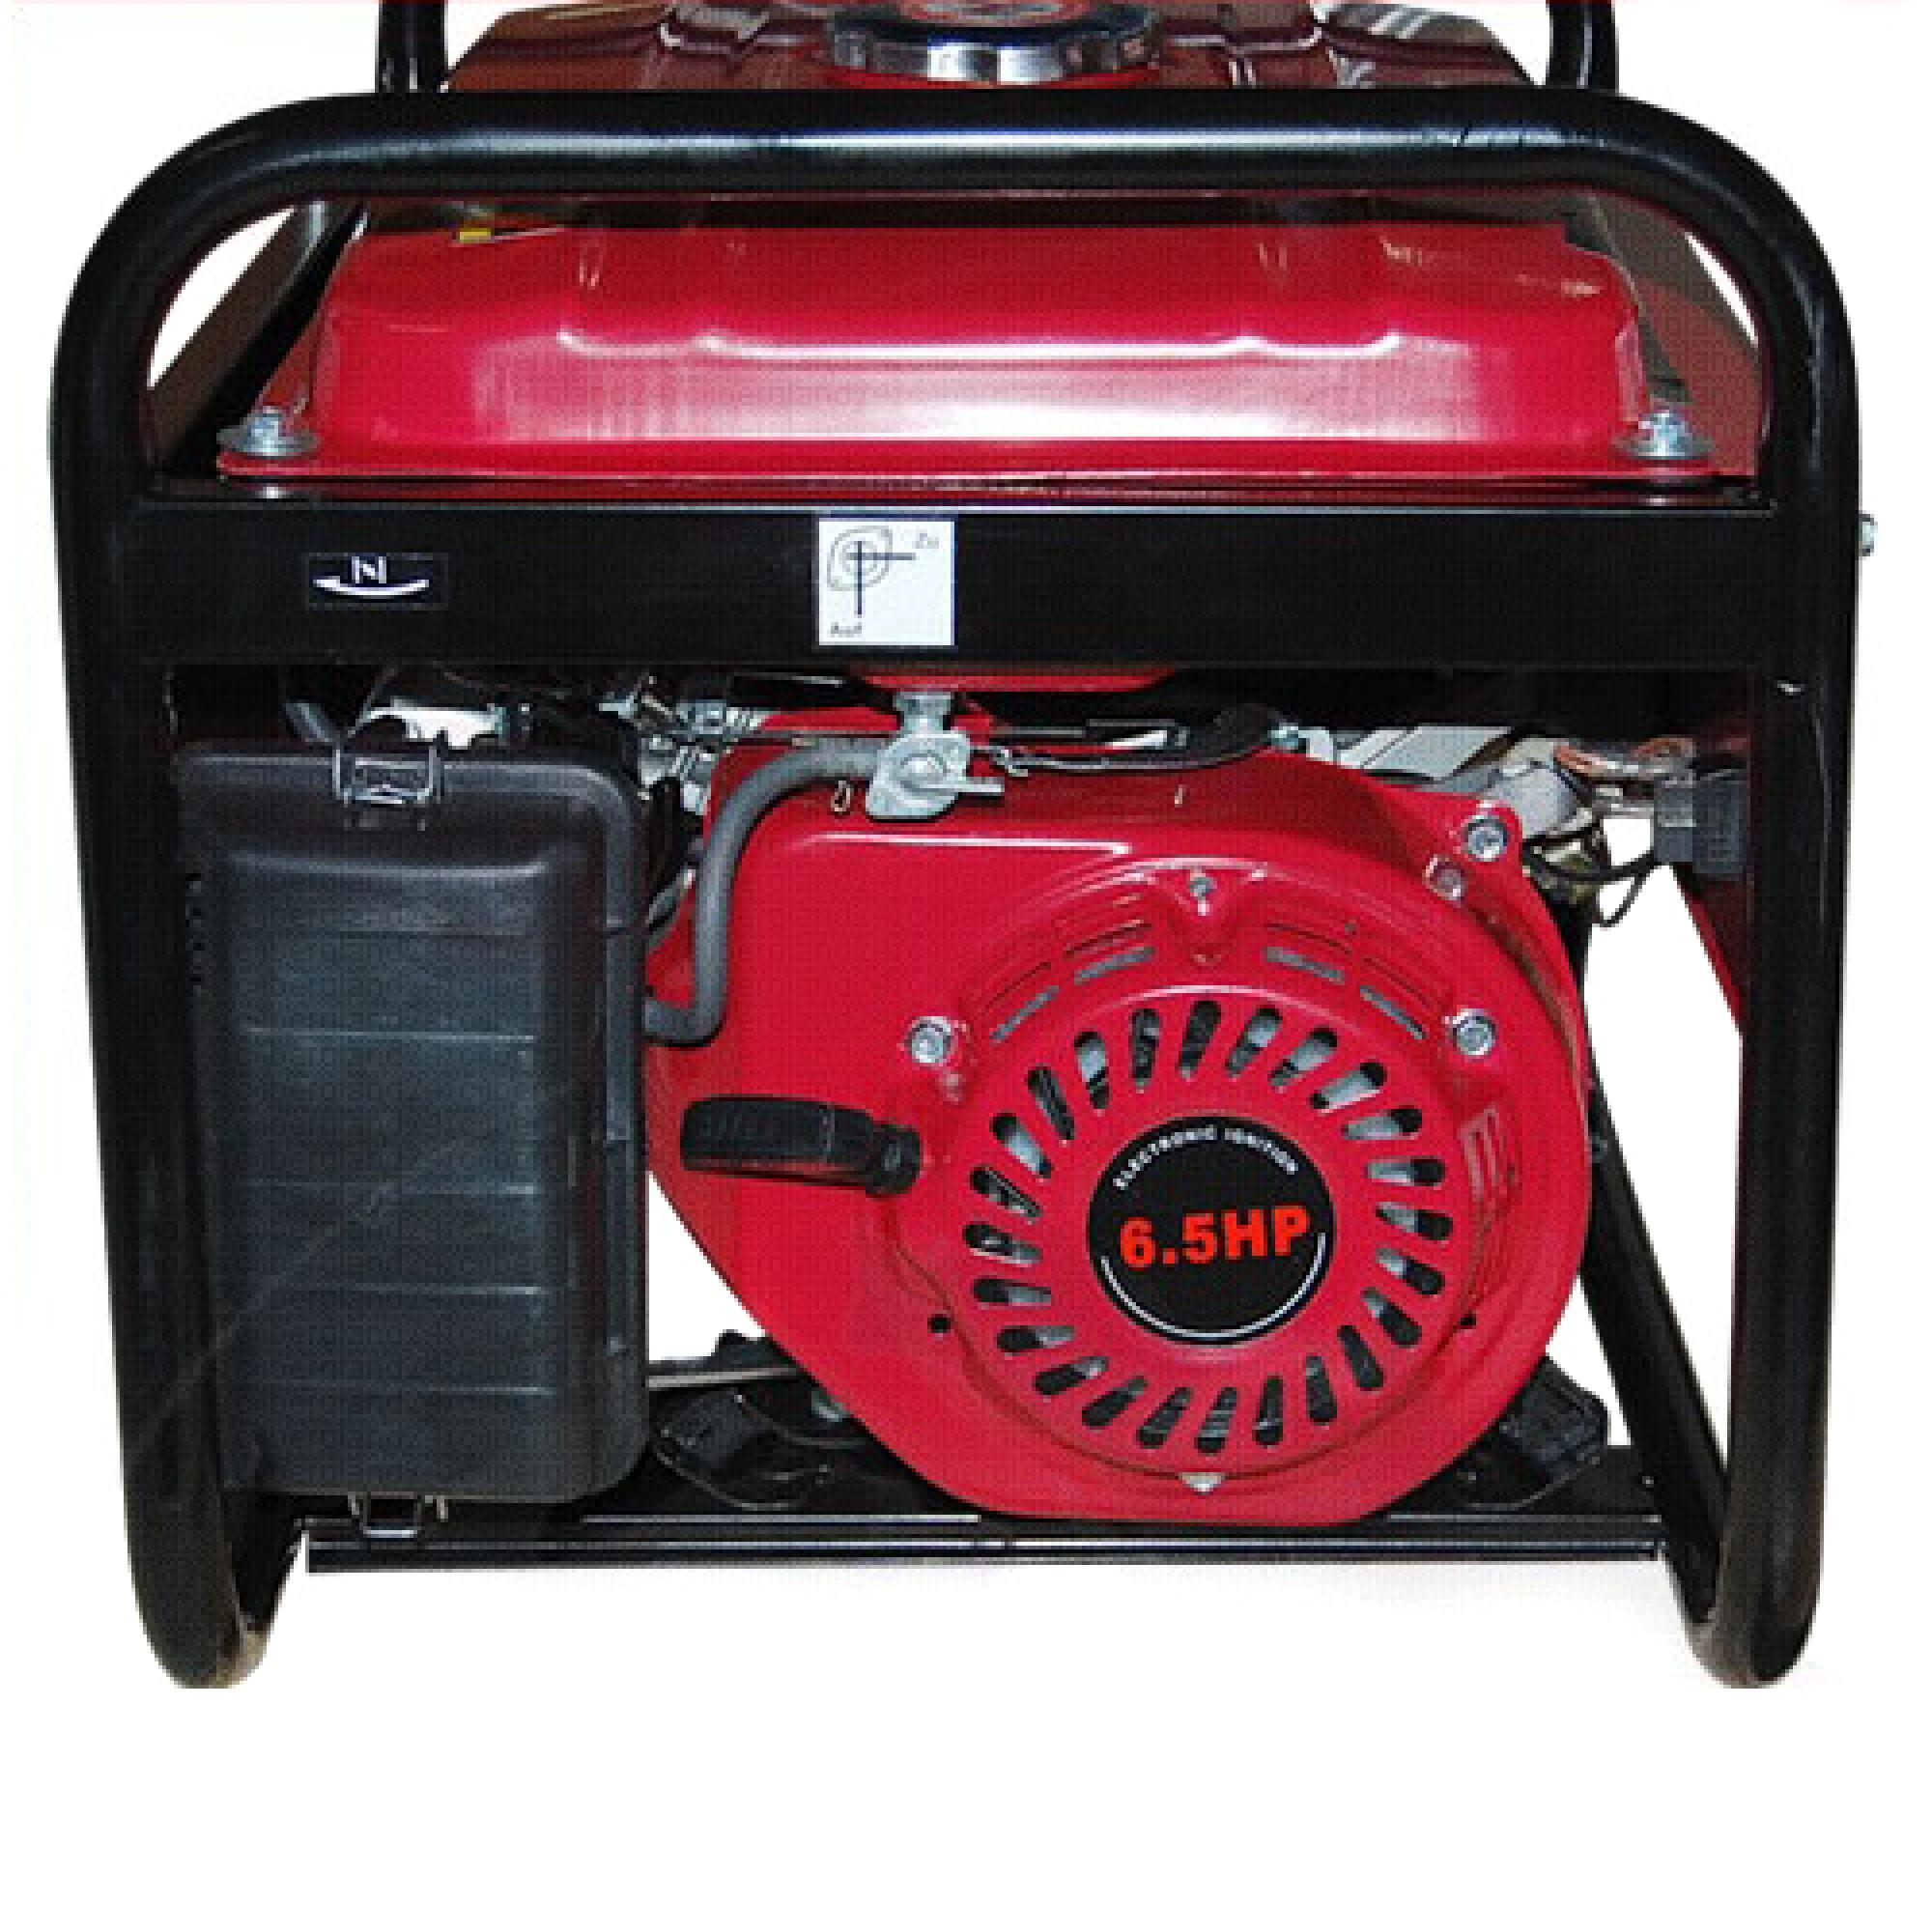 stromerzeuger 2800 watt 6 5 ps generator stromaggregat. Black Bedroom Furniture Sets. Home Design Ideas